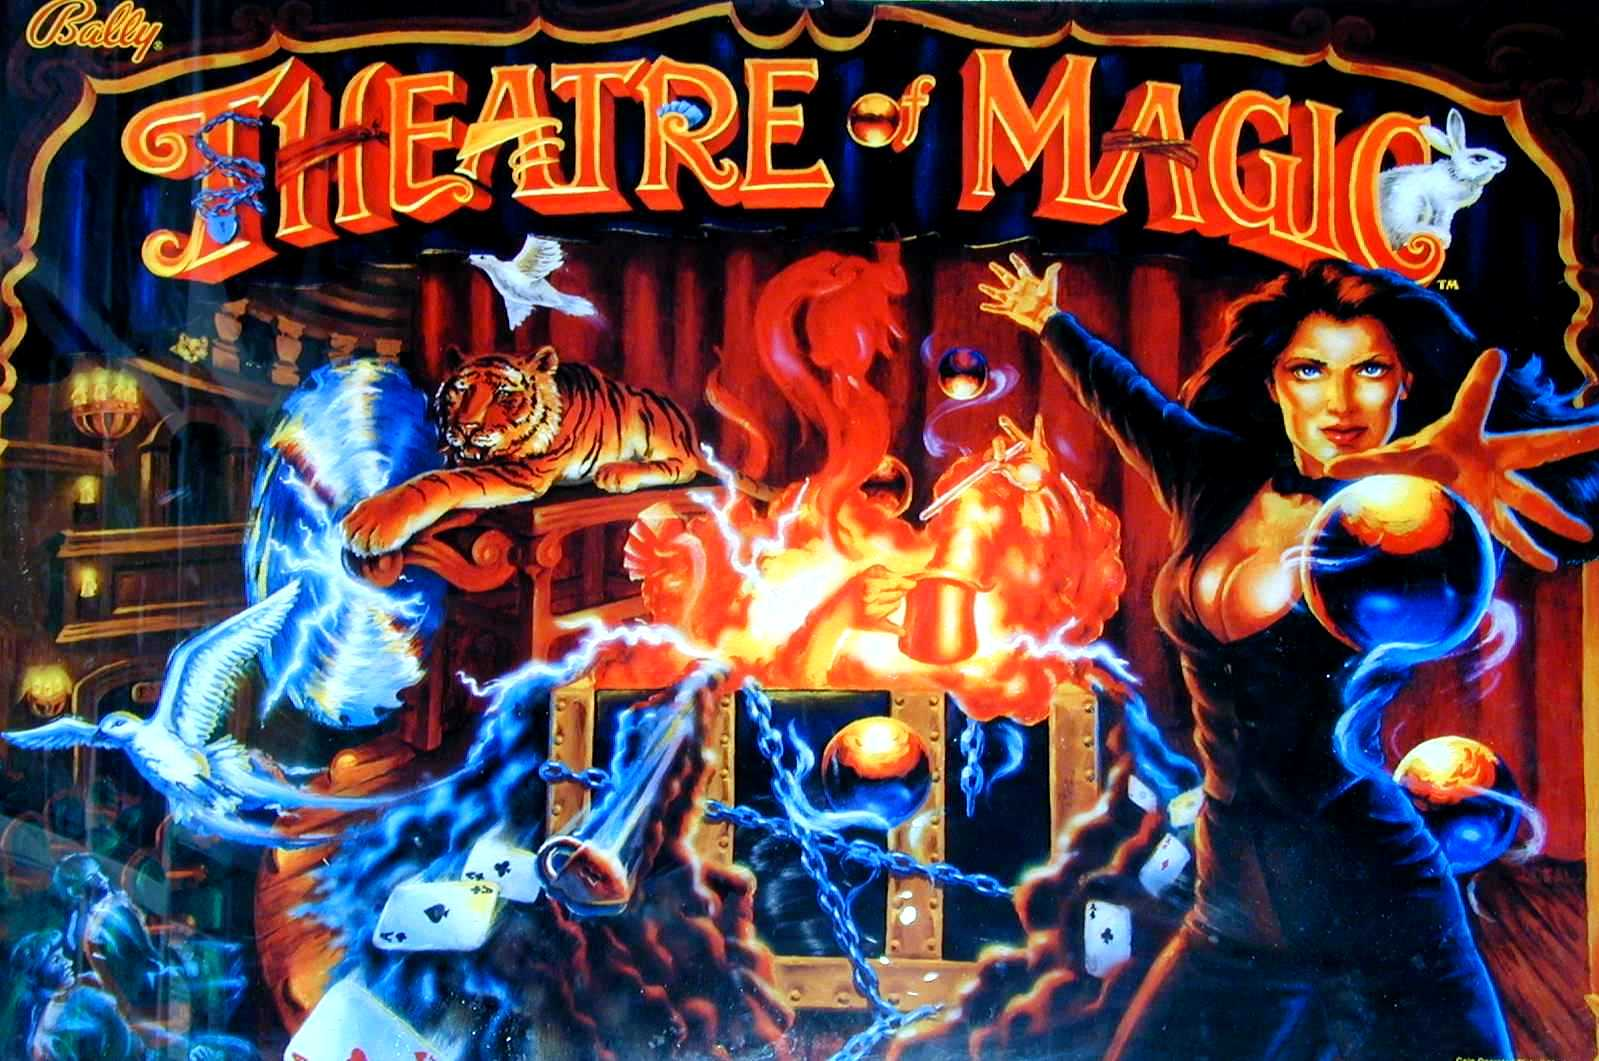 Theater Of Magic Billiards N More